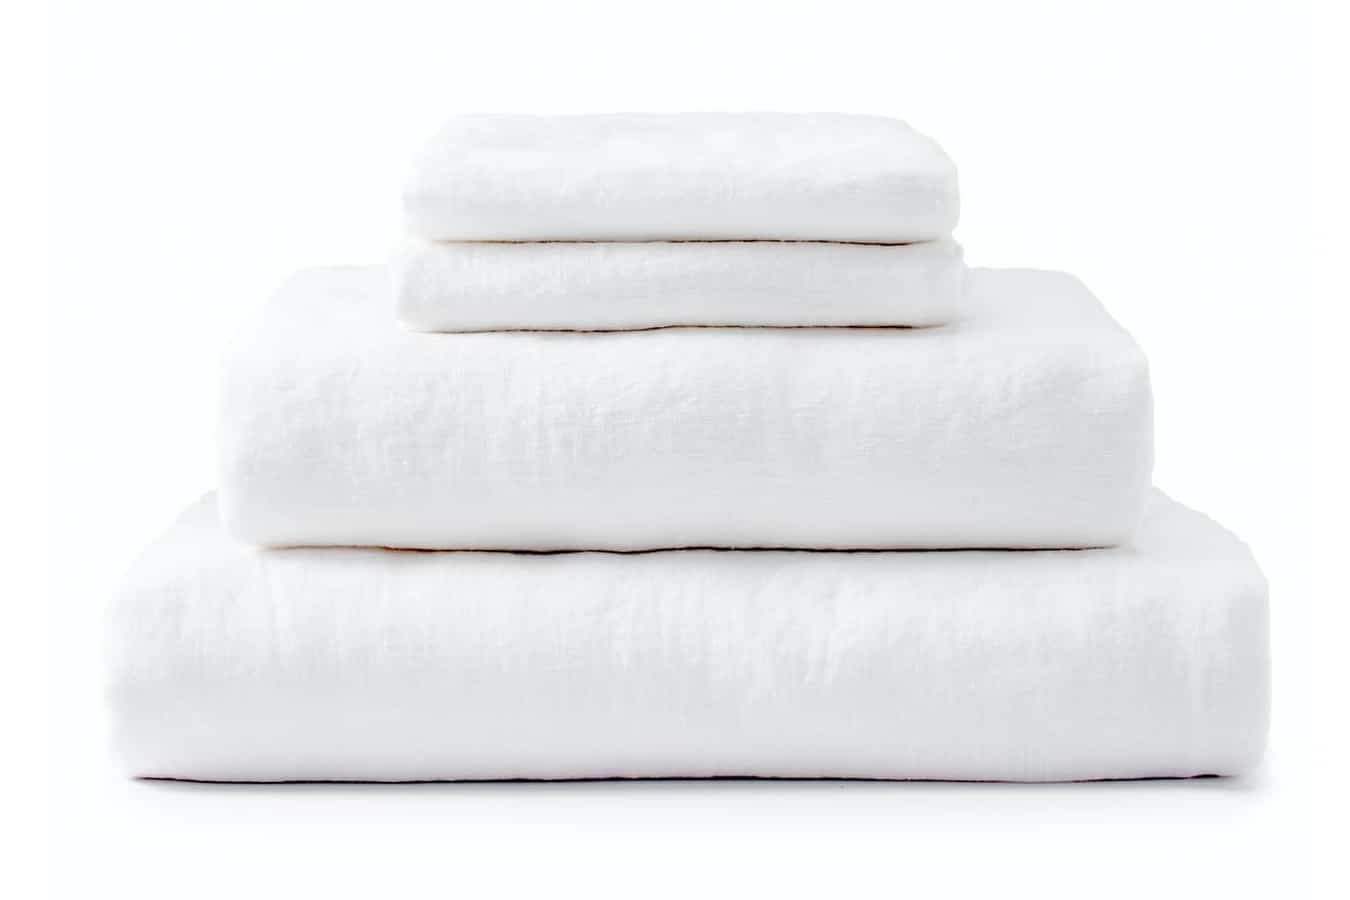 upstate stonewashed linen sheet set queen